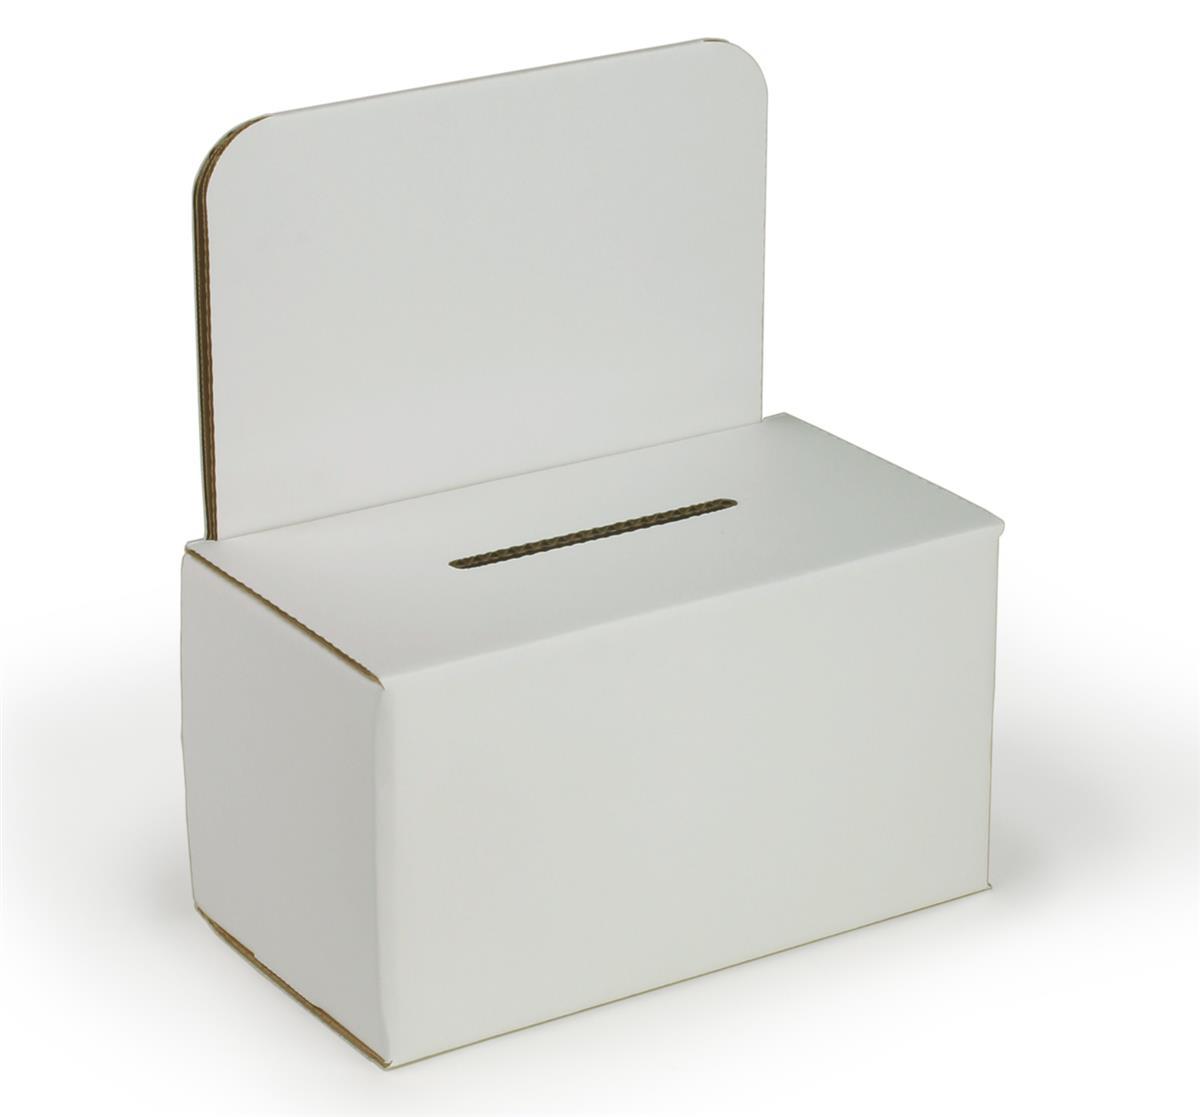 Corrugated Suggestion Box Header For Signage